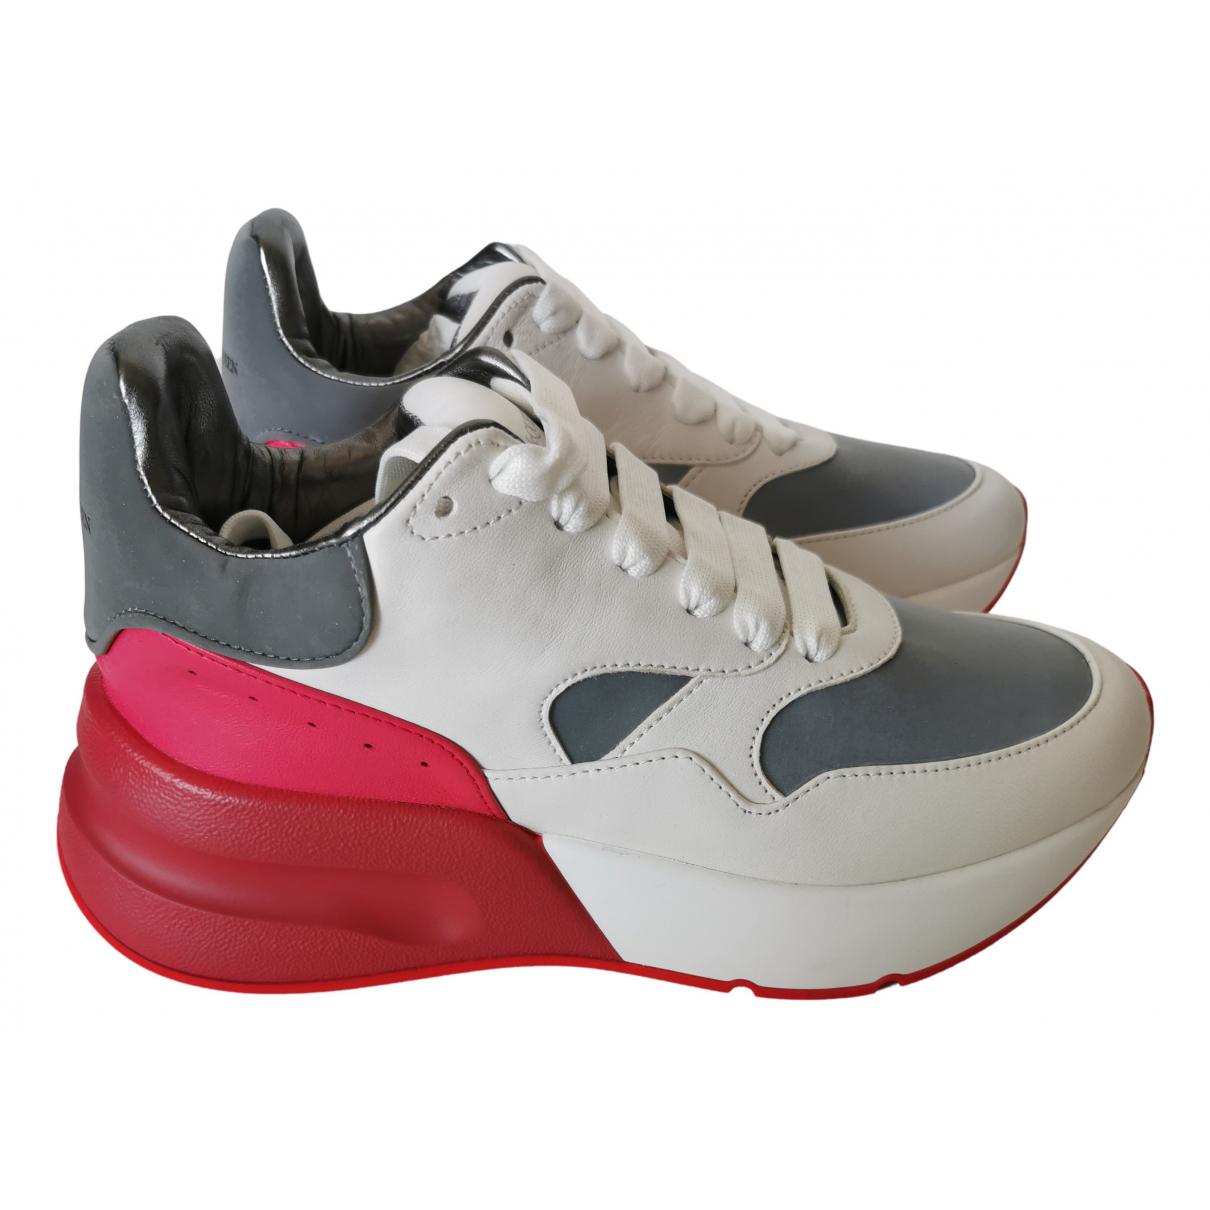 Alexander Mcqueen \N Sneakers in  Weiss Leder